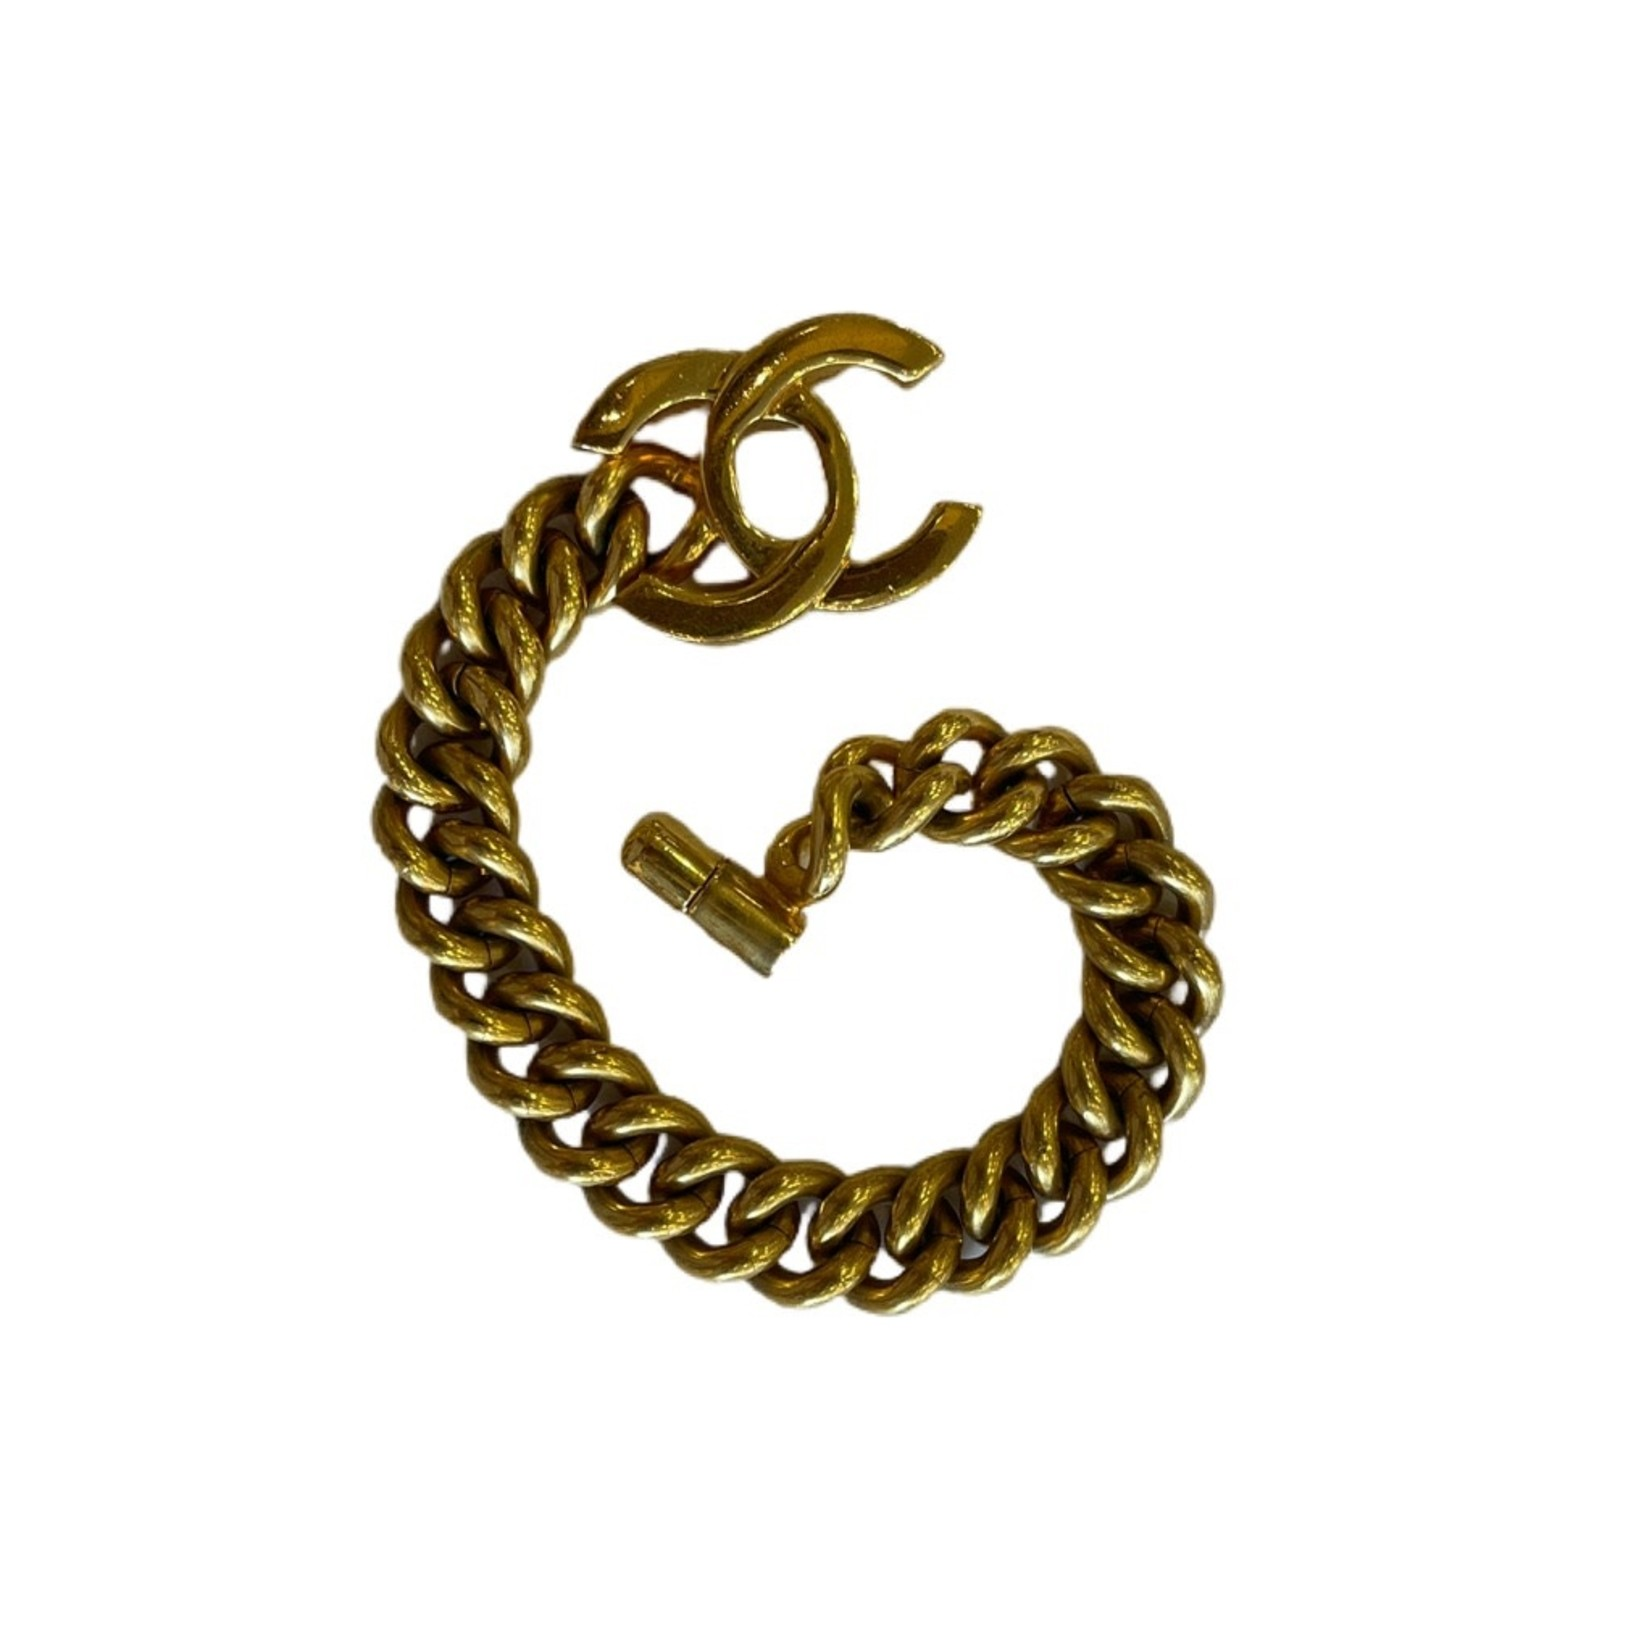 Wyld Blue Vintage Gold Chanel Turnlock Bracelet Medium